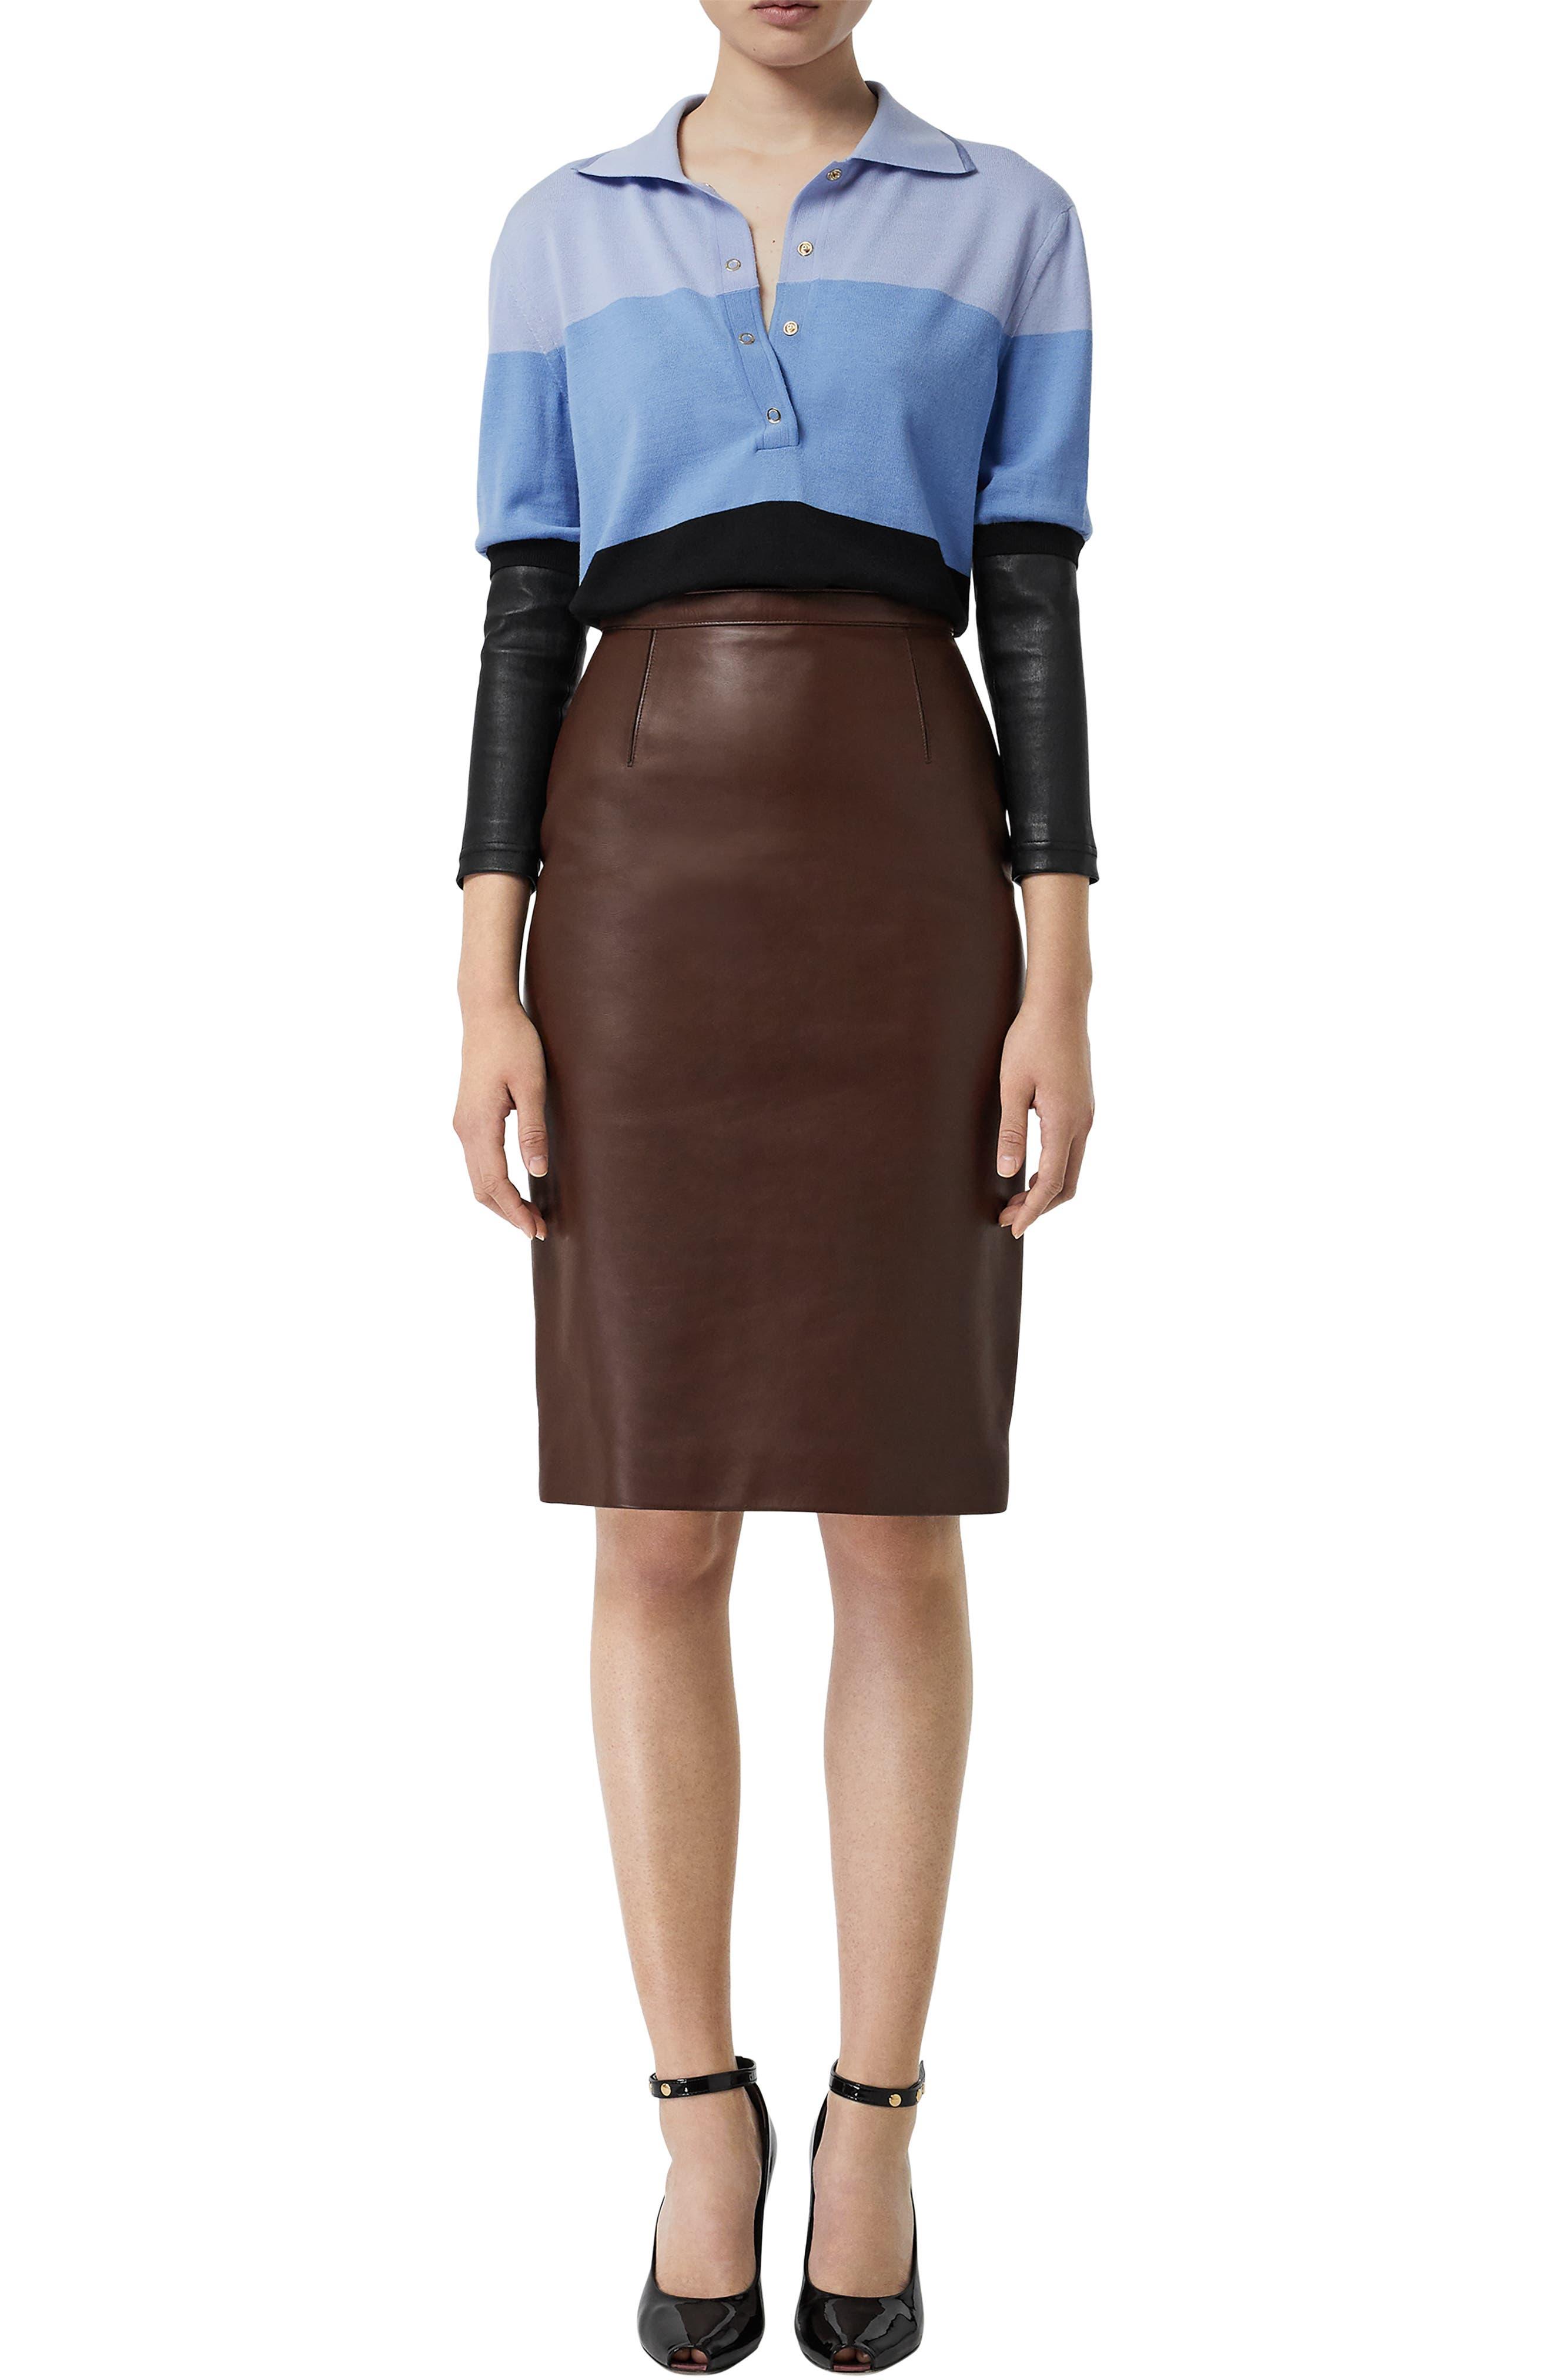 Women's Clothing Skirts Burberry Wool Blend Straight Skirt Black Sz 8 Fine Quality